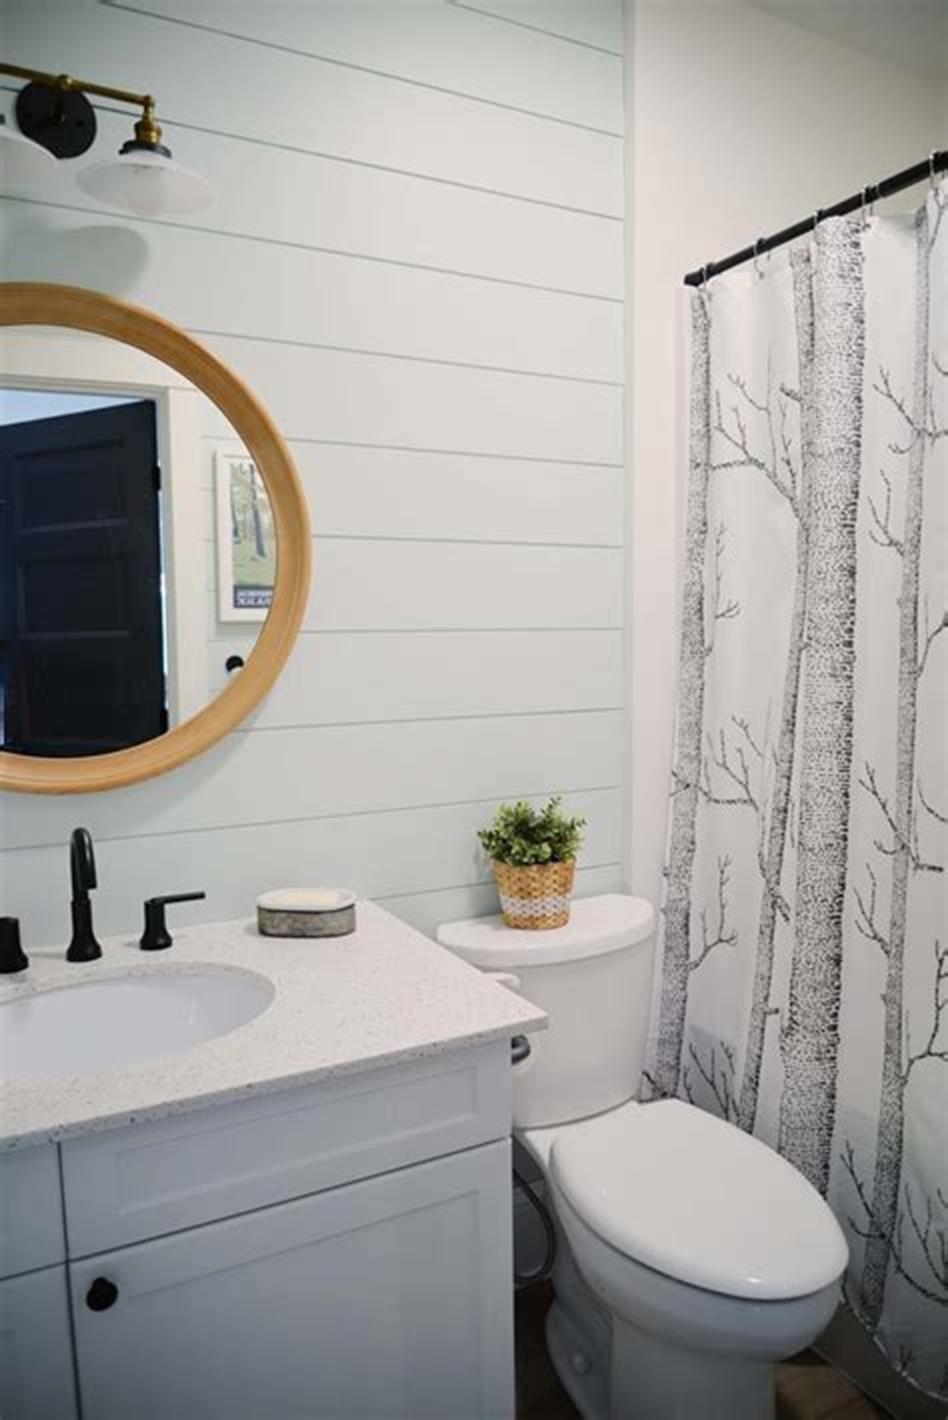 50 Best Modern Country Bathroom Design And Decor Ideas For 2019 Modern Country Bathrooms Mint Green Bathrooms Small Bathroom